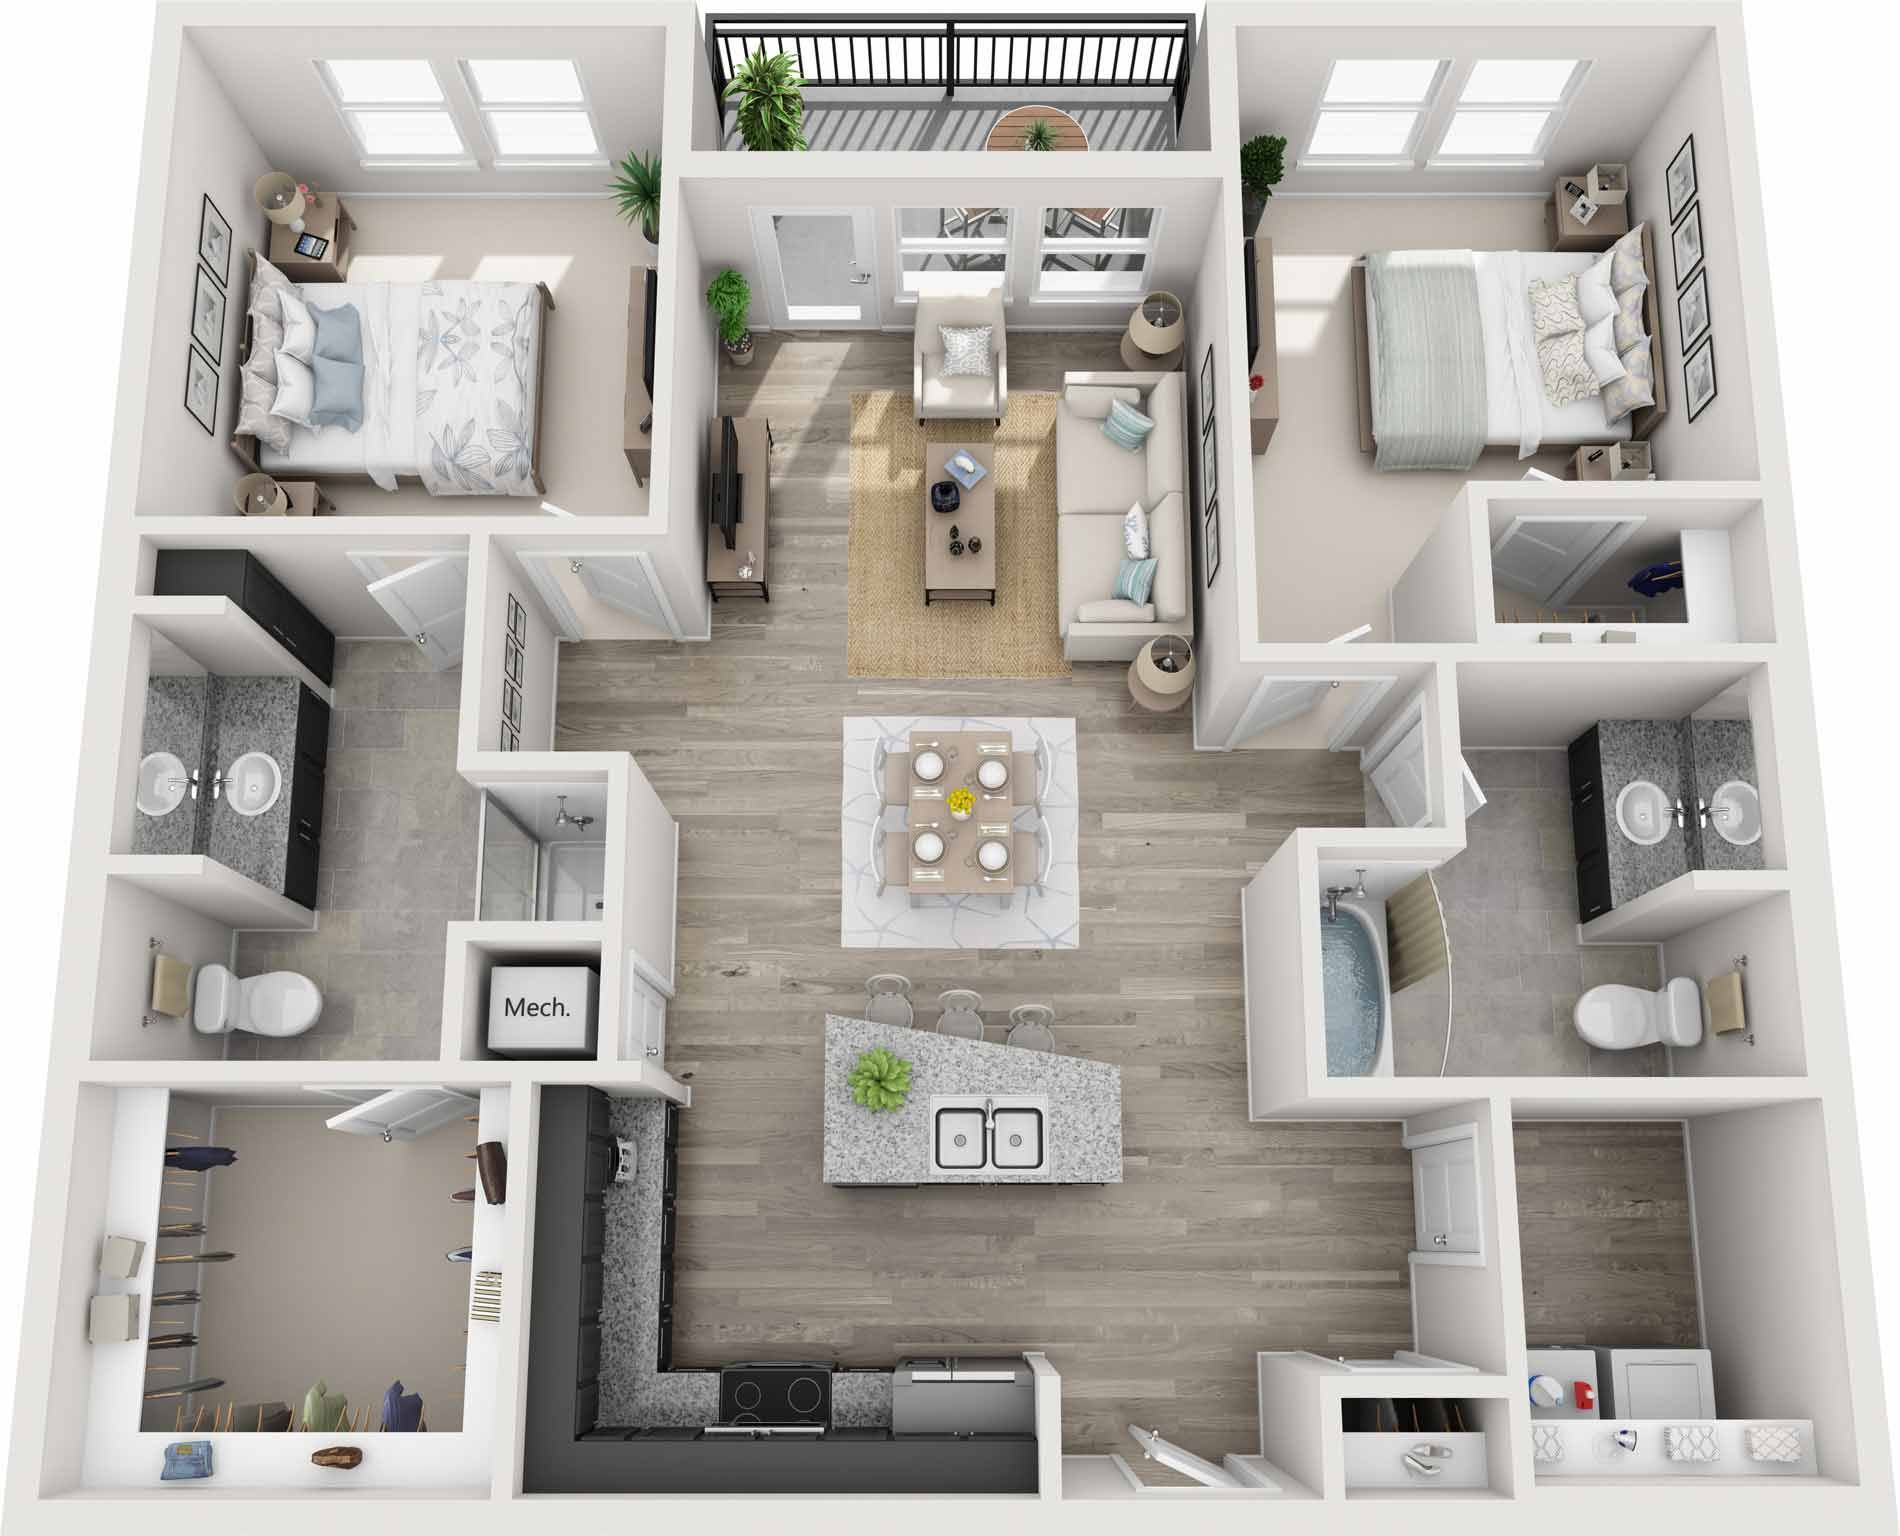 Luxury 2 Bedroom Apartments In Nashville 1211 Square Feet Apartment Layout House Floor Design Home Design Floor Plans